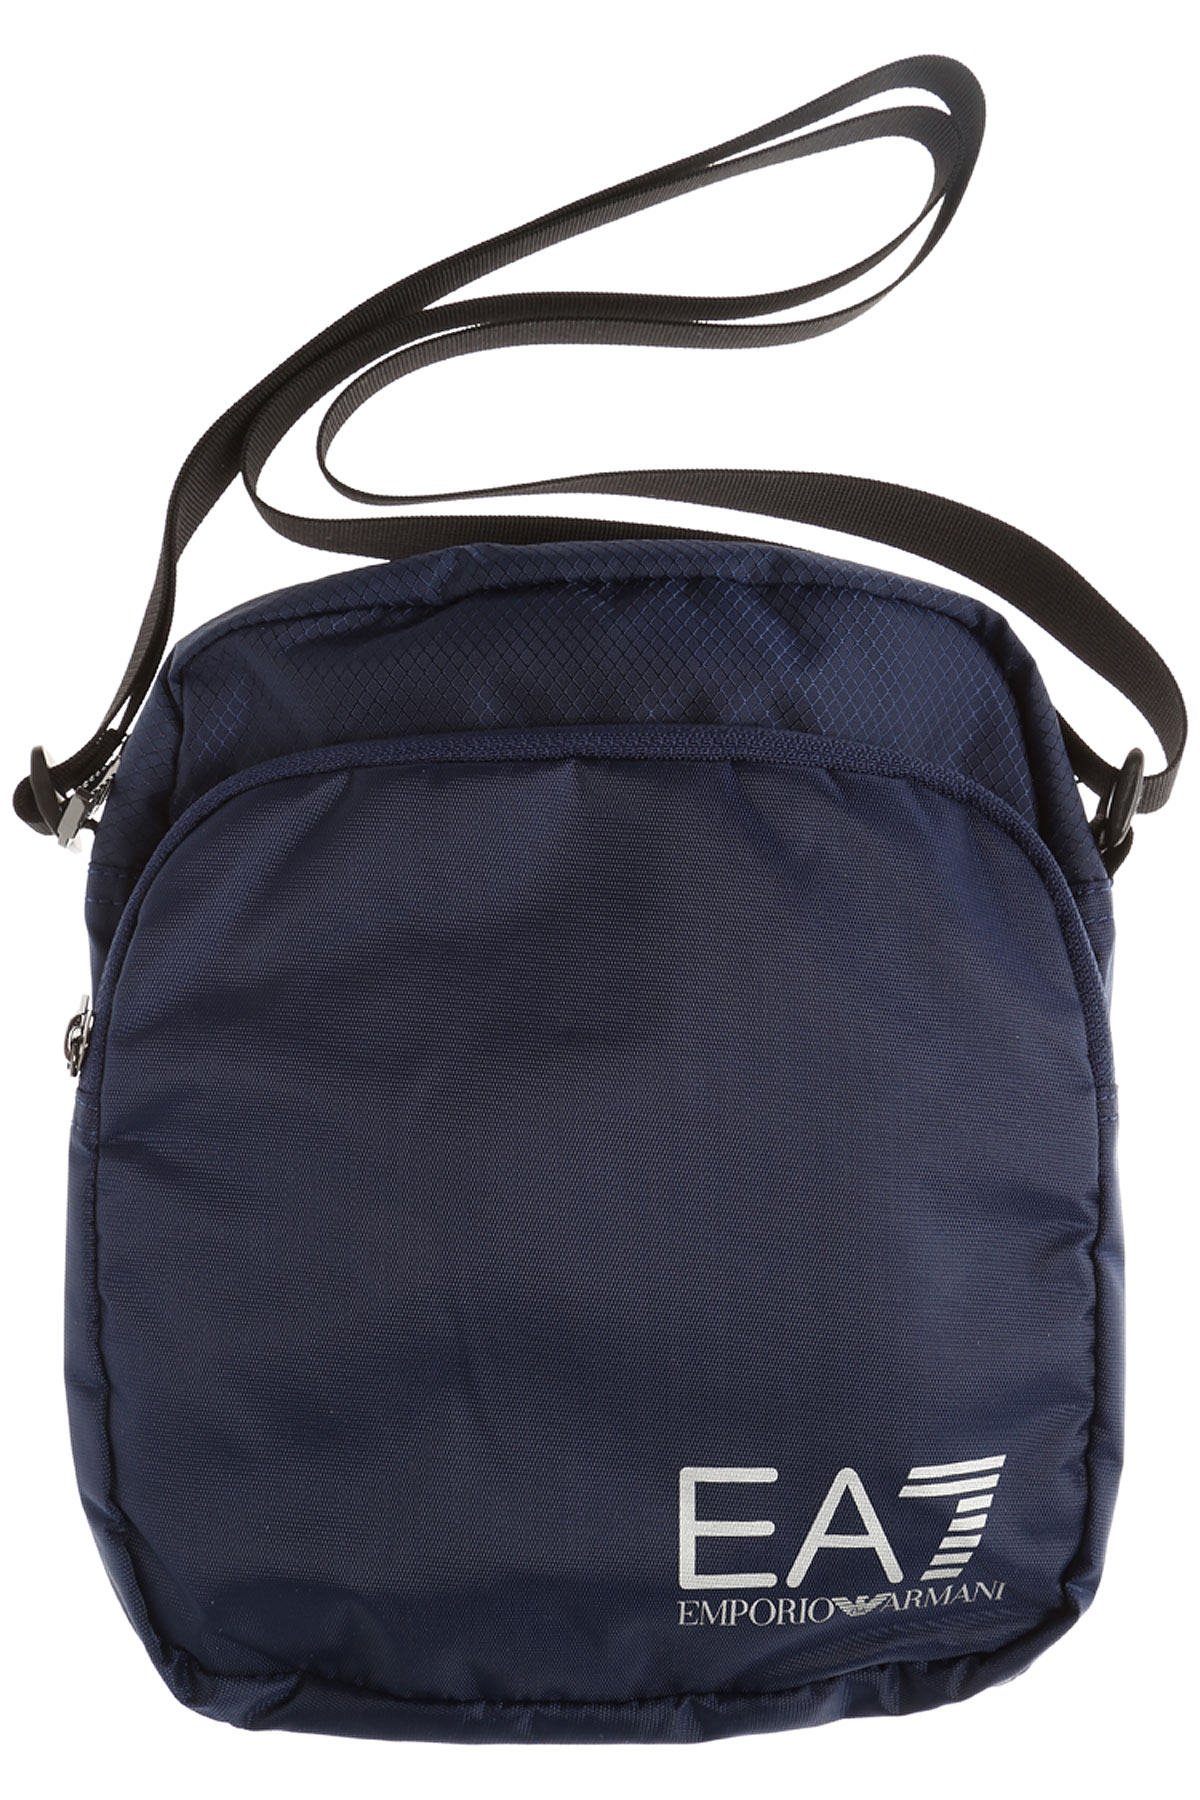 Image of Emporio Armani Messenger Bag for Men, Train Prime Pouch, Blue, polyamide, 2017